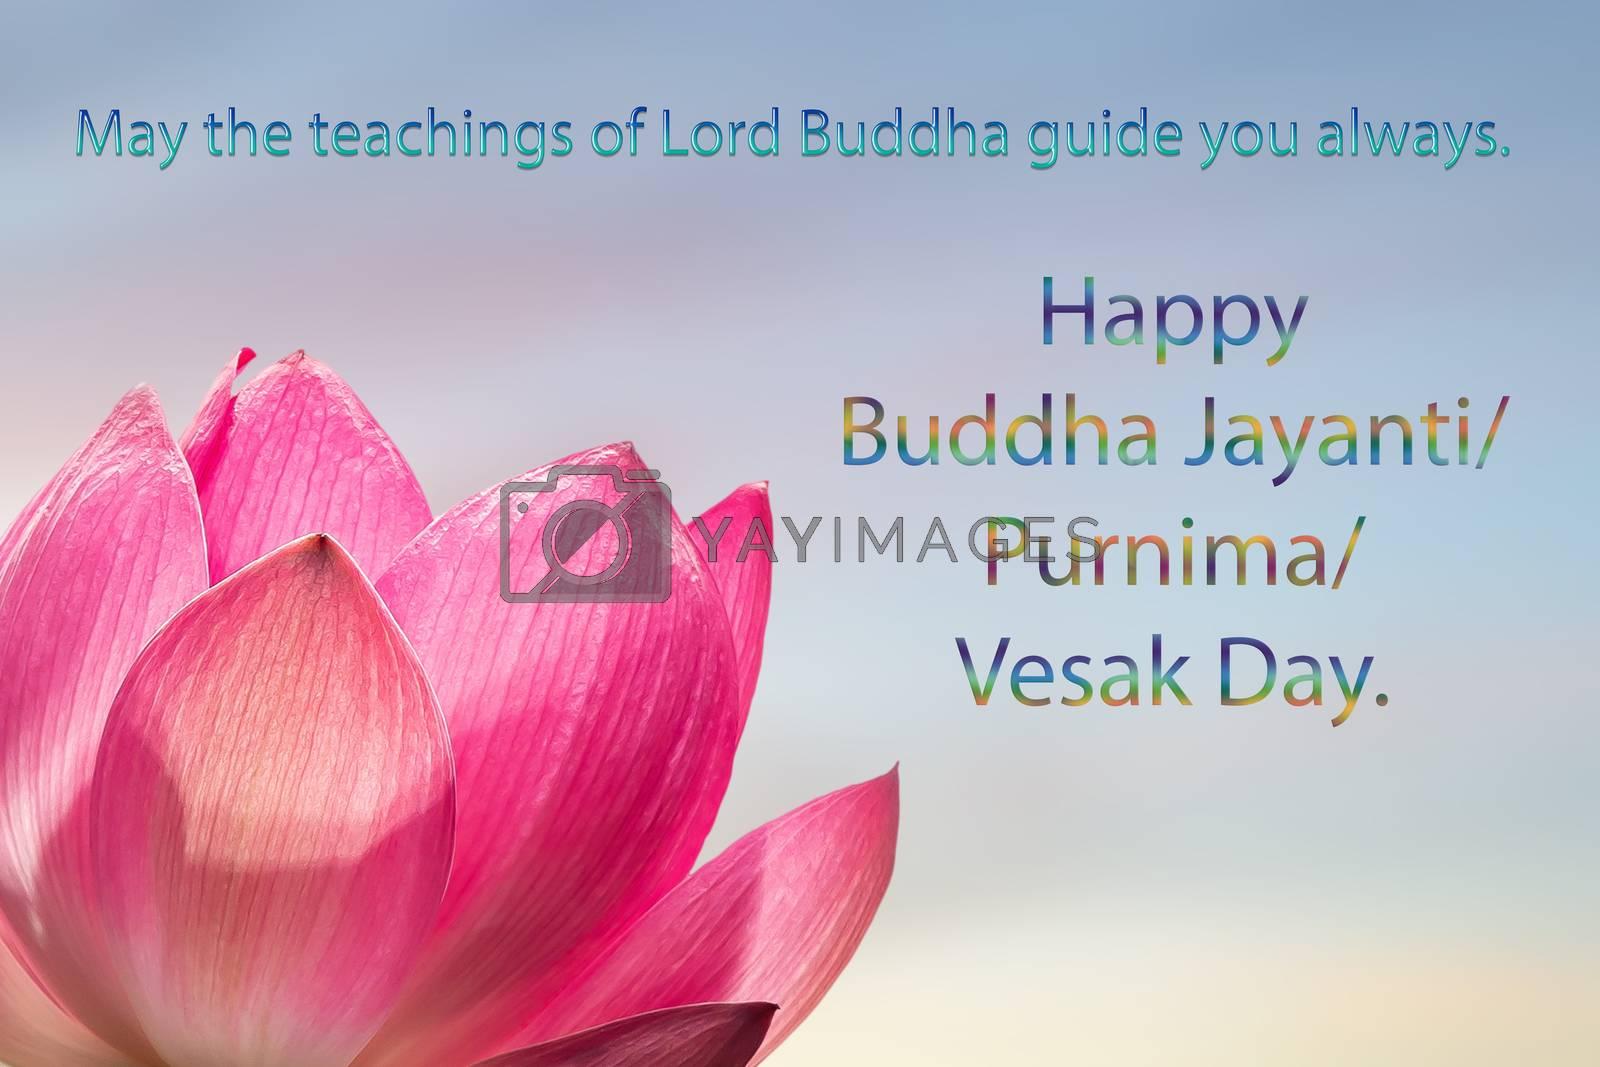 Congratulations to the Buddhist celebration of Buddha's birthday, called Vesak Day, Buddhist lent, the Buddha's birthday, the worship of Buddha Purnima. Text on a pink Lotus flower background.